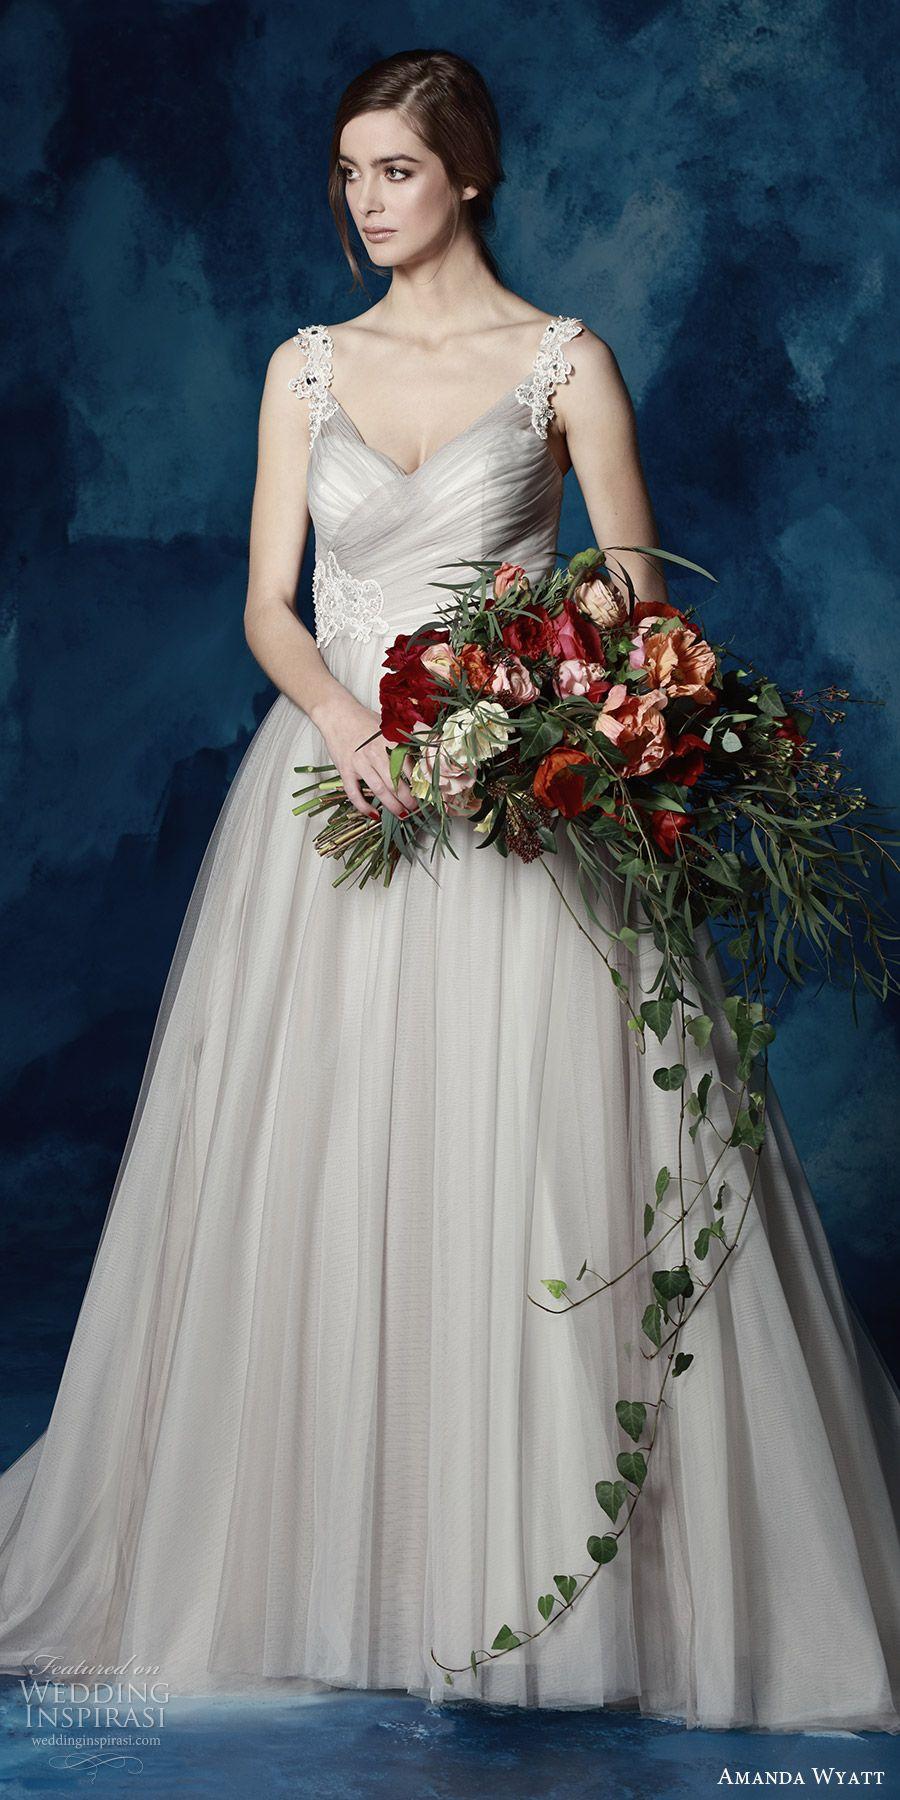 "Amanda Wyatt 2017 Wedding Dresses ""She Walks with Beauty"" Bridal Collection (North) #bridal #wedding #weddingdress #weddinggown #bridalgown #dreamgown #dreamdress #engaged #inspiration #bridalinspiration #weddinginspiration"